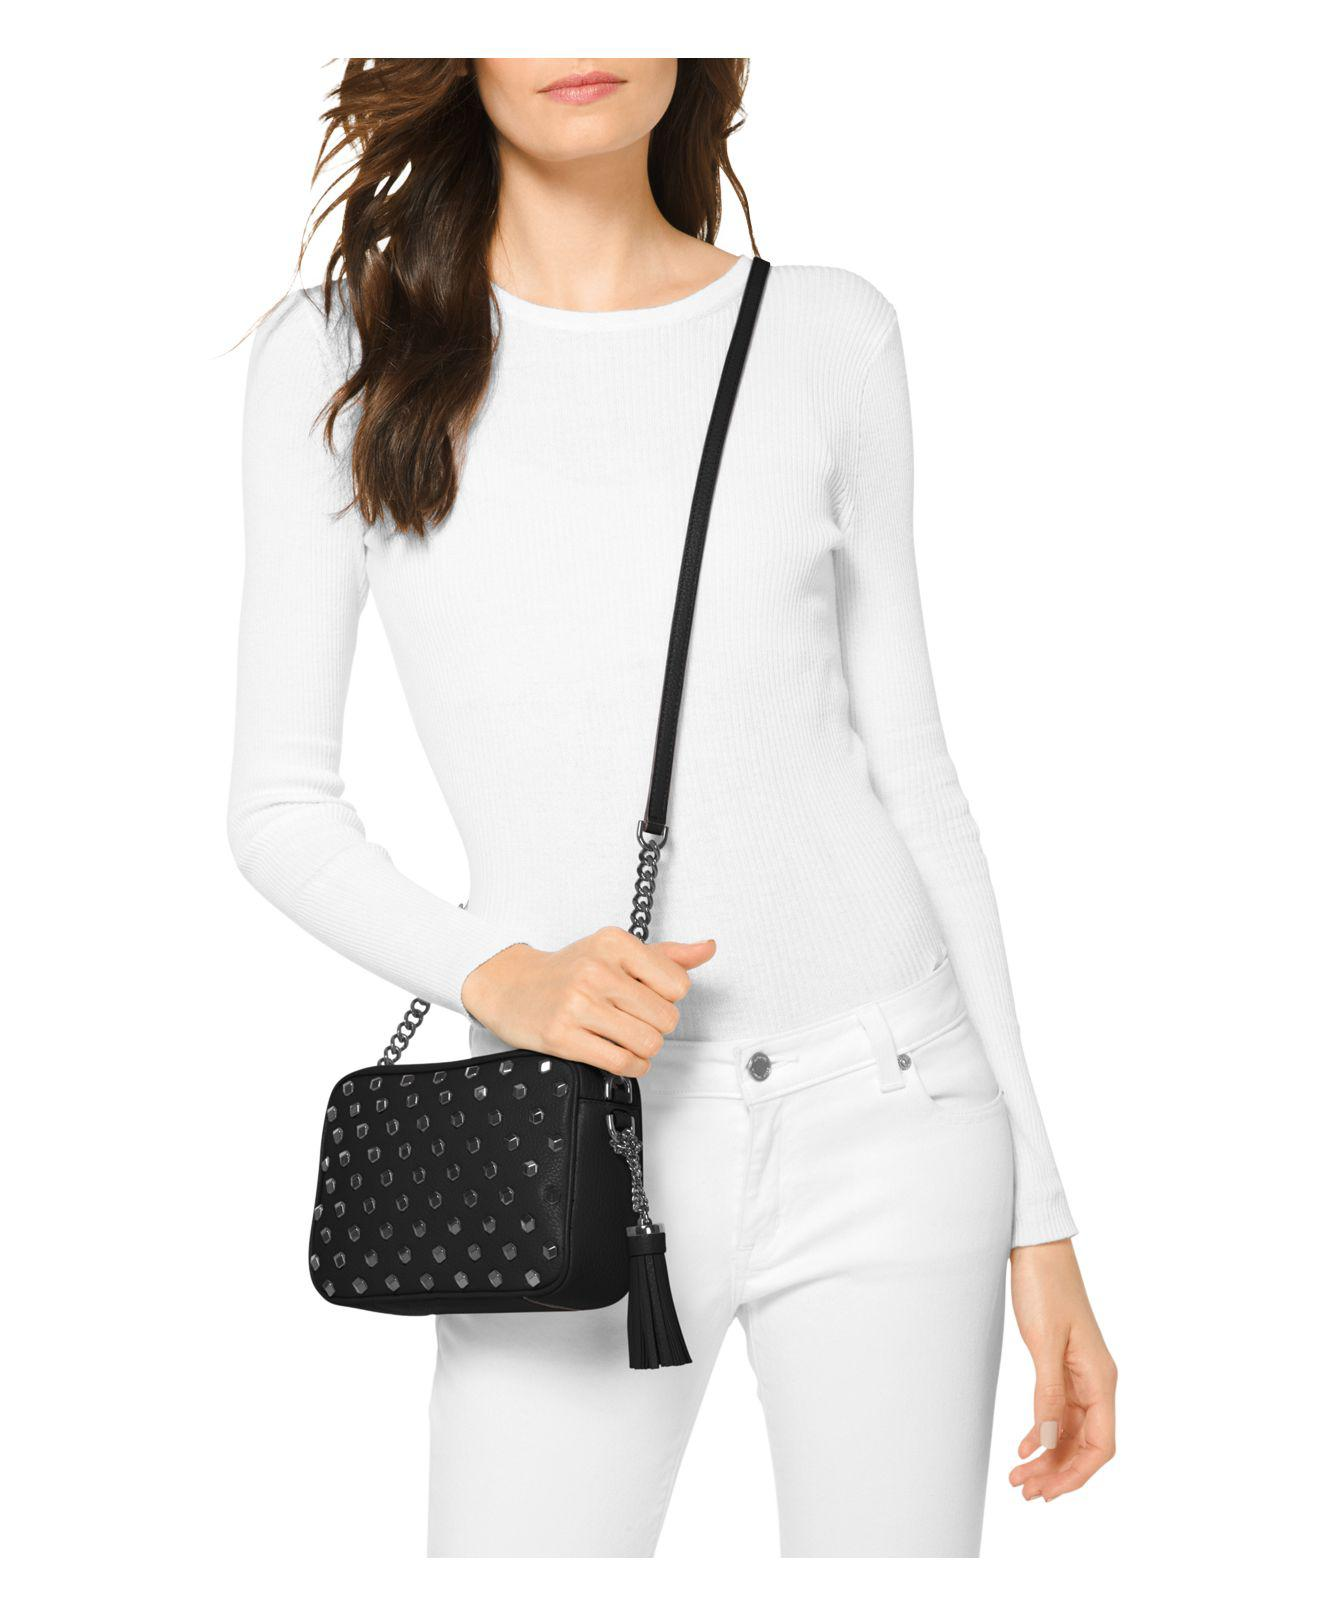 Ginny Stud Leather Crossbody Bag